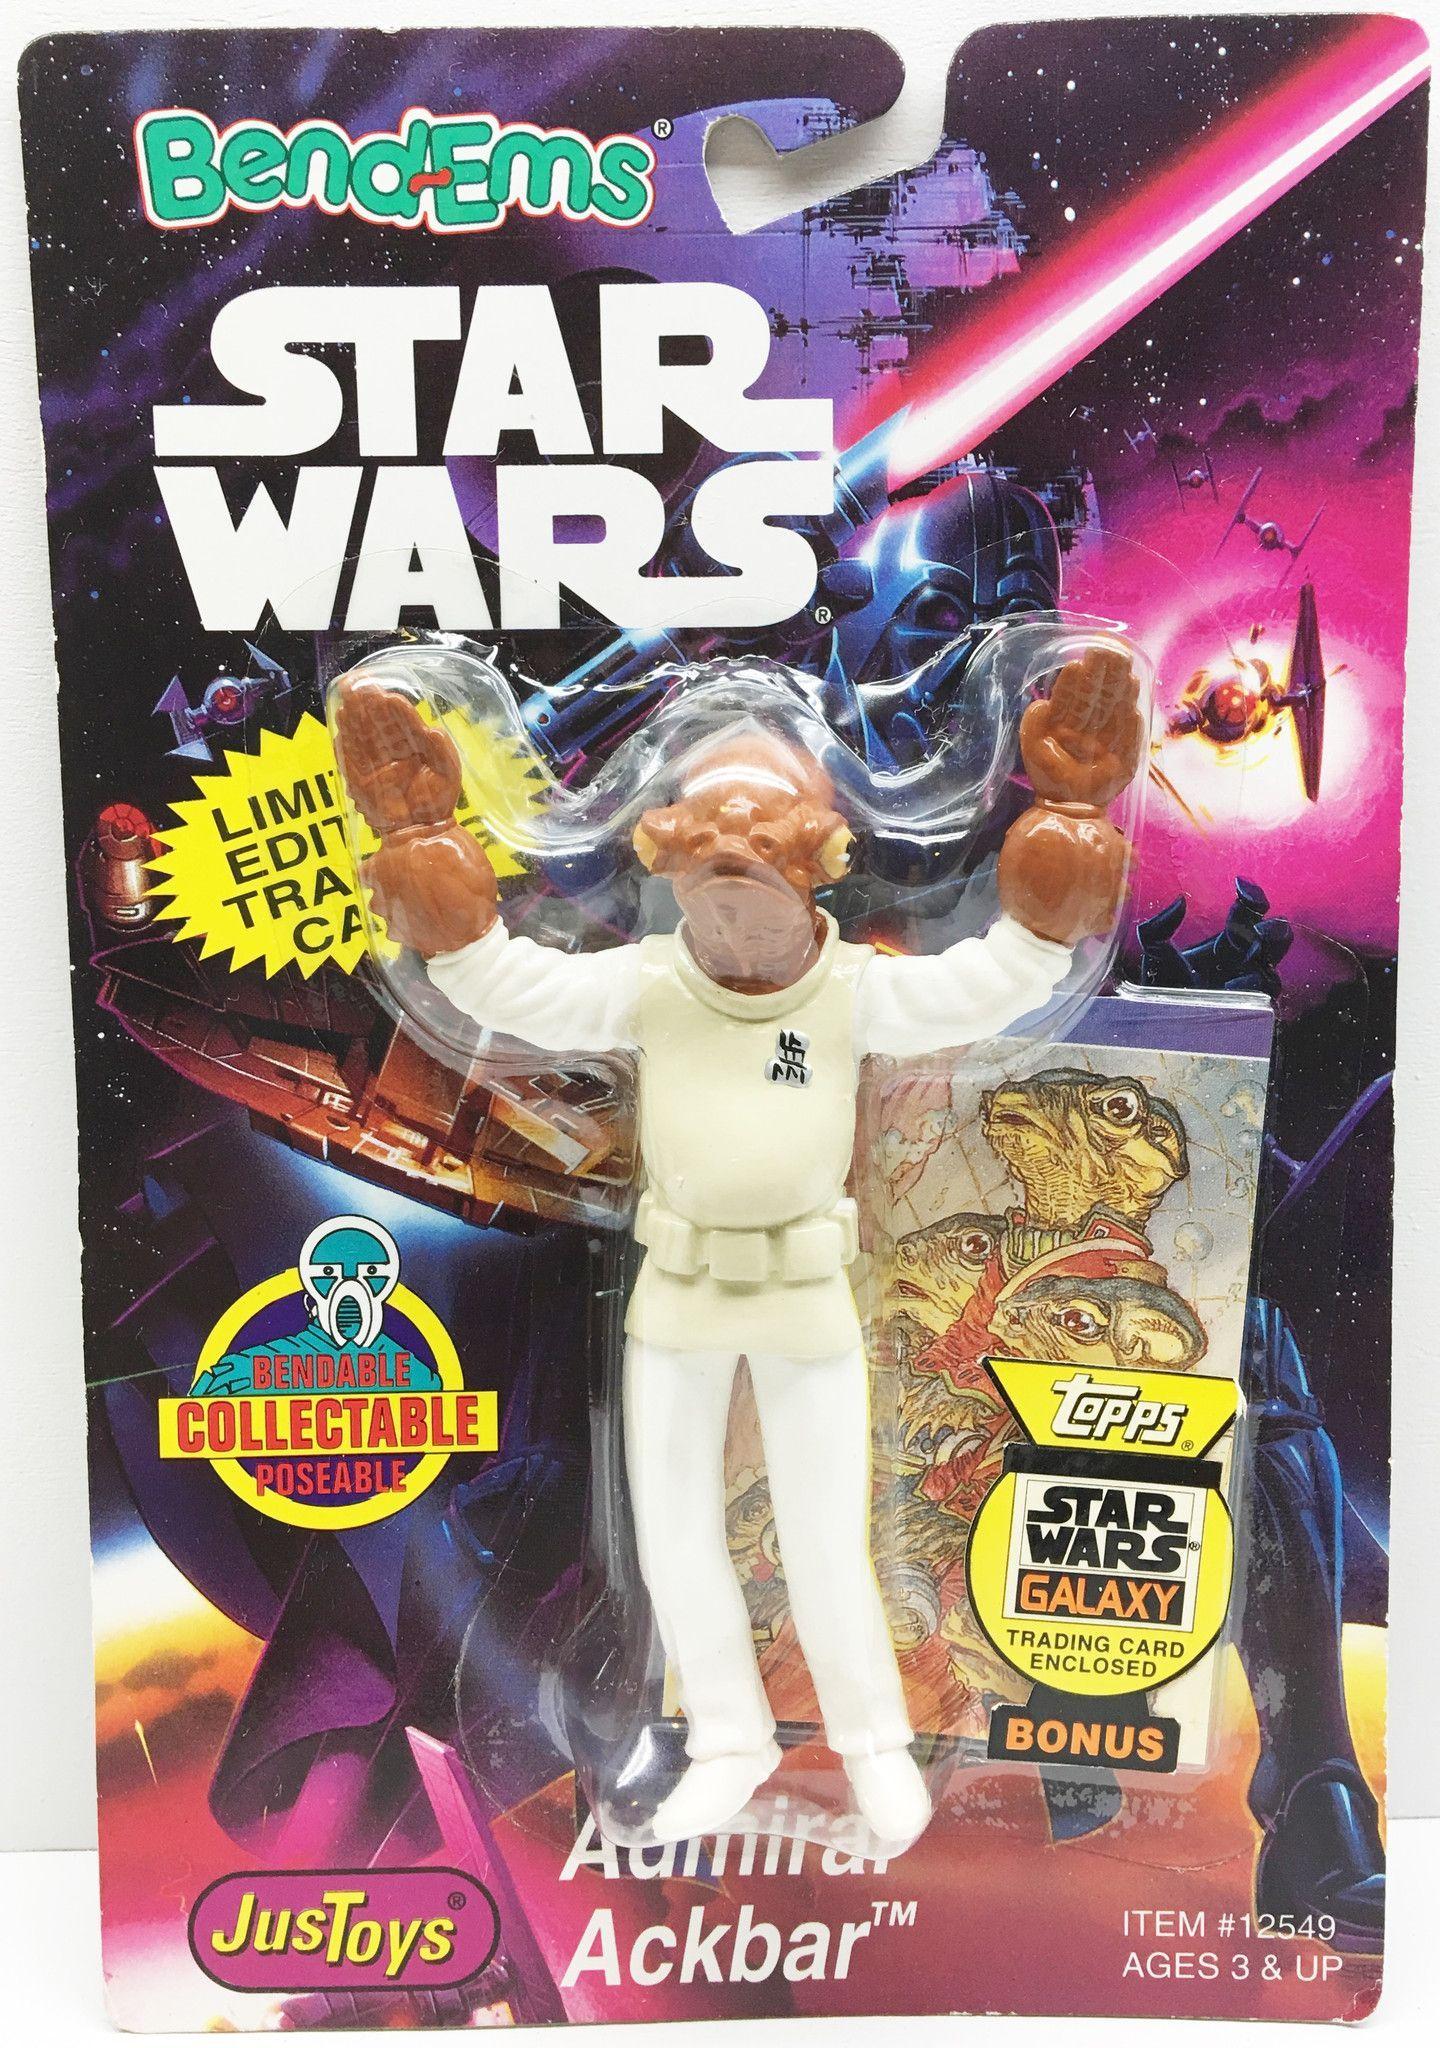 (TAS032992) - 1994 Just Toys Star Wars Bend-Ems Action Figure - Admiral Ackbar